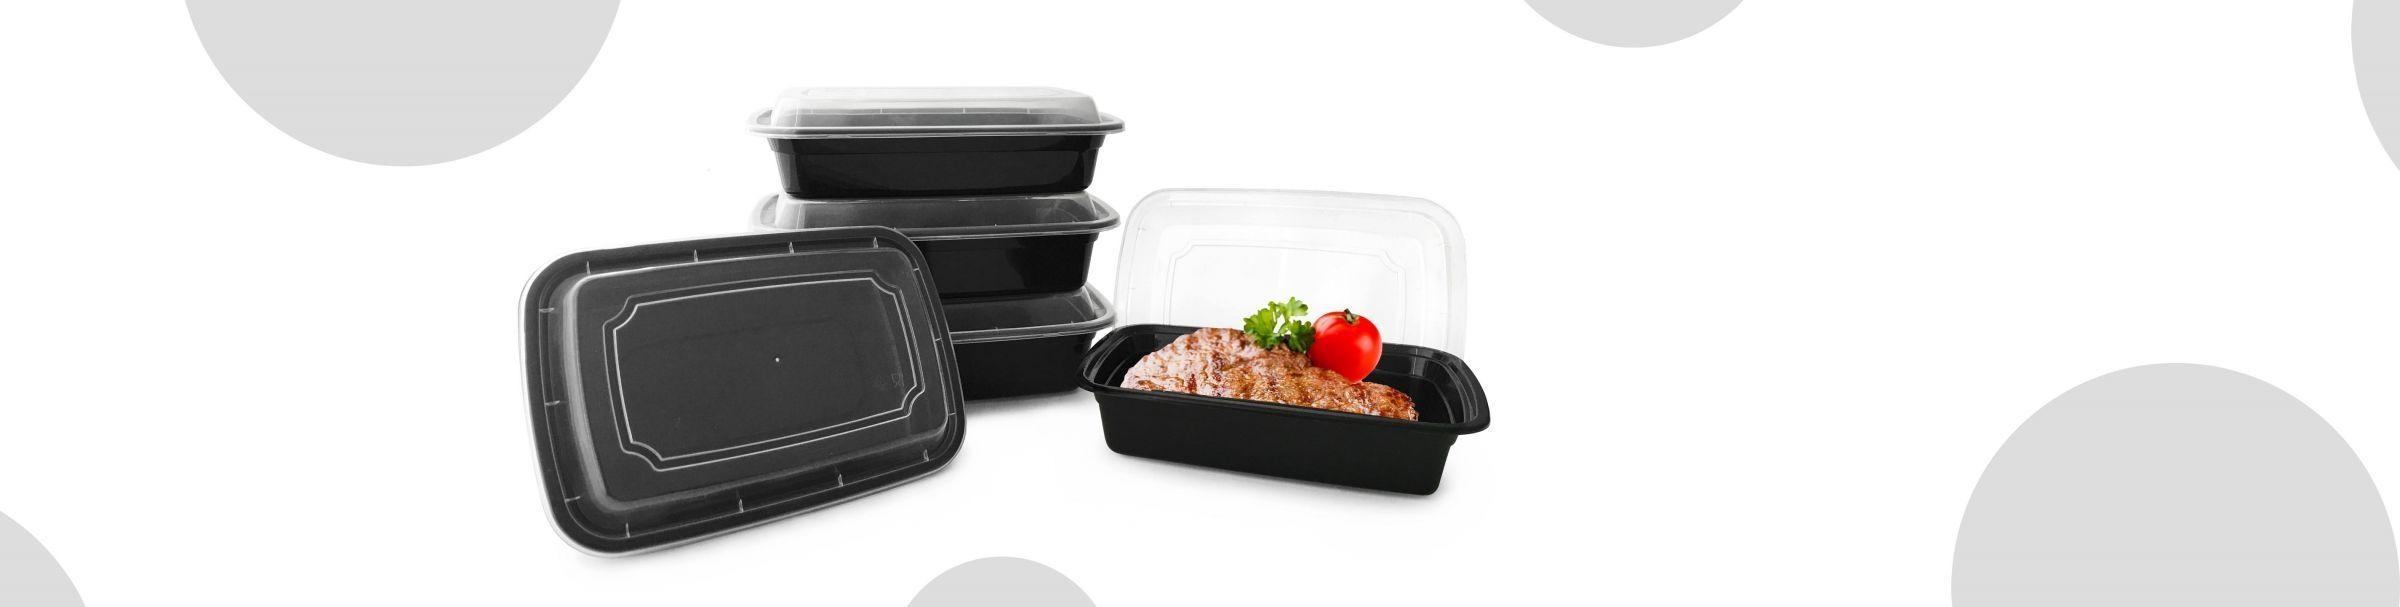 Heat-resistant Plastic Box Microwave-safe